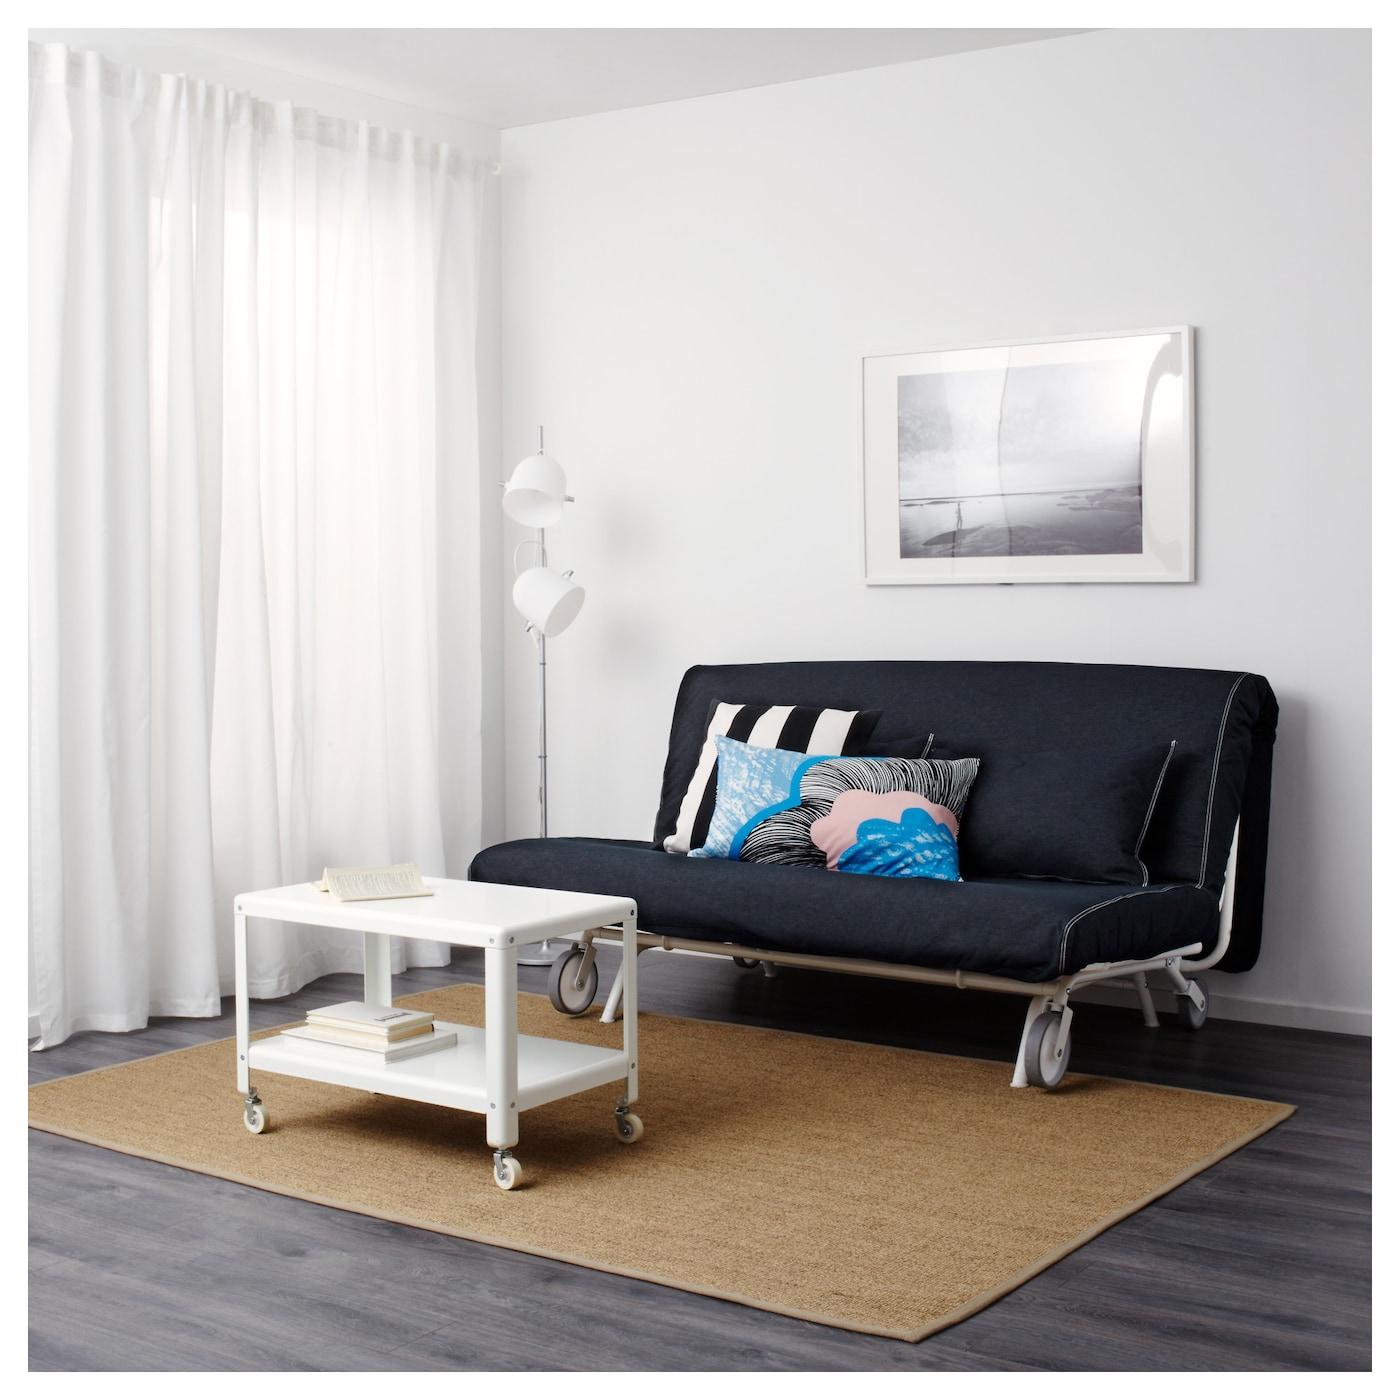 Ikea Ps ikea ps lövås two seat sofa bed vansta blue ikea